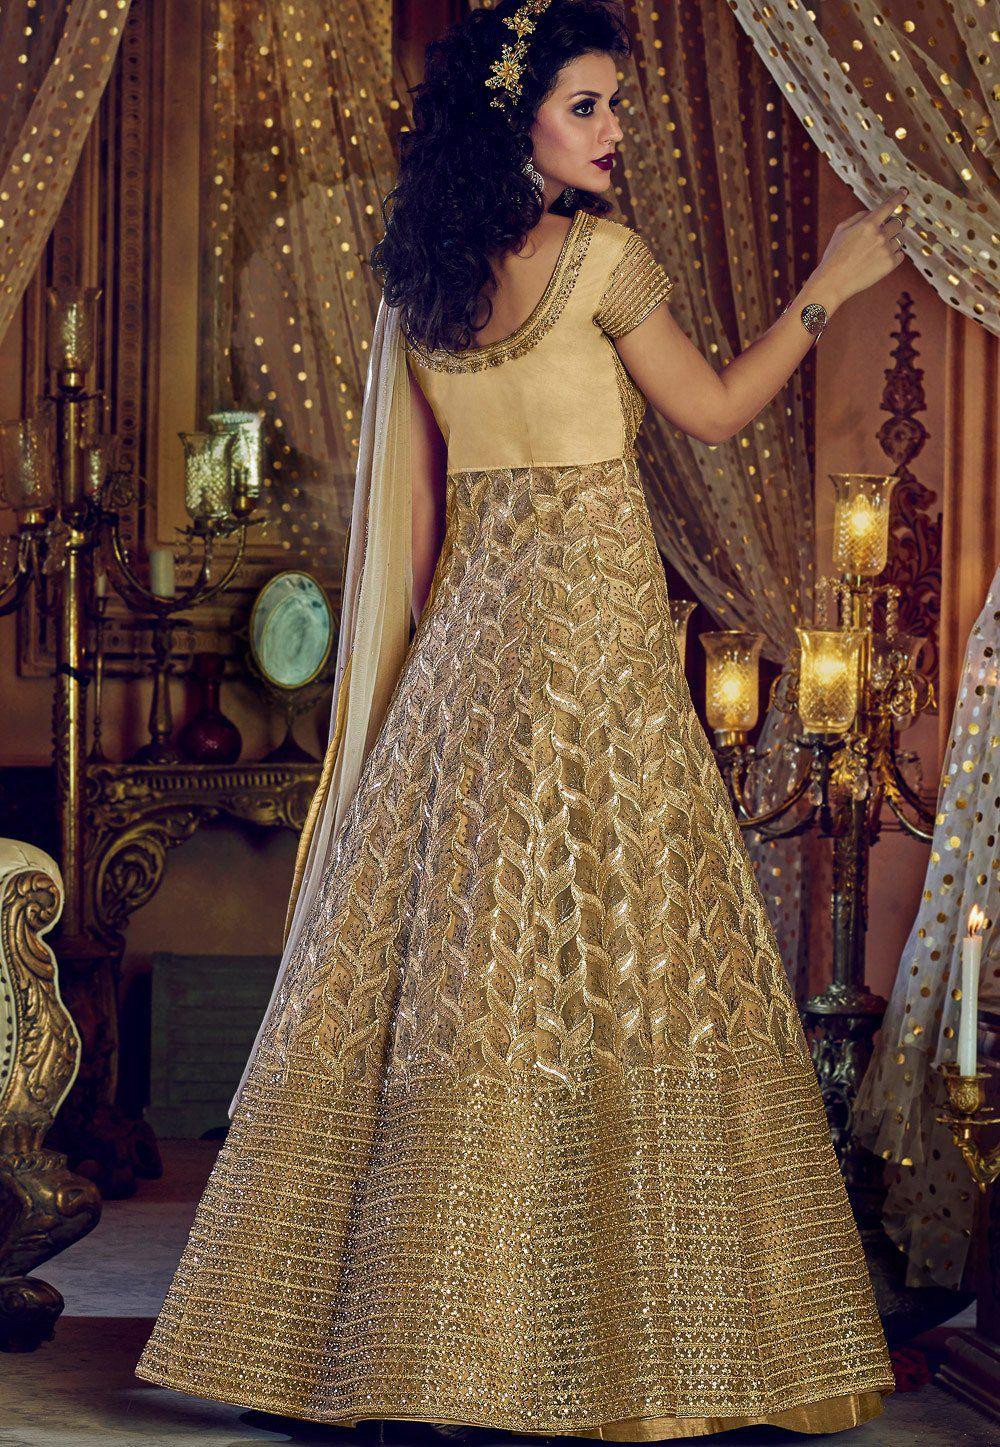 d7ebc9b2d1 Buy Chiku color Net and Banglori silk party wear Lehenga kameez in ...